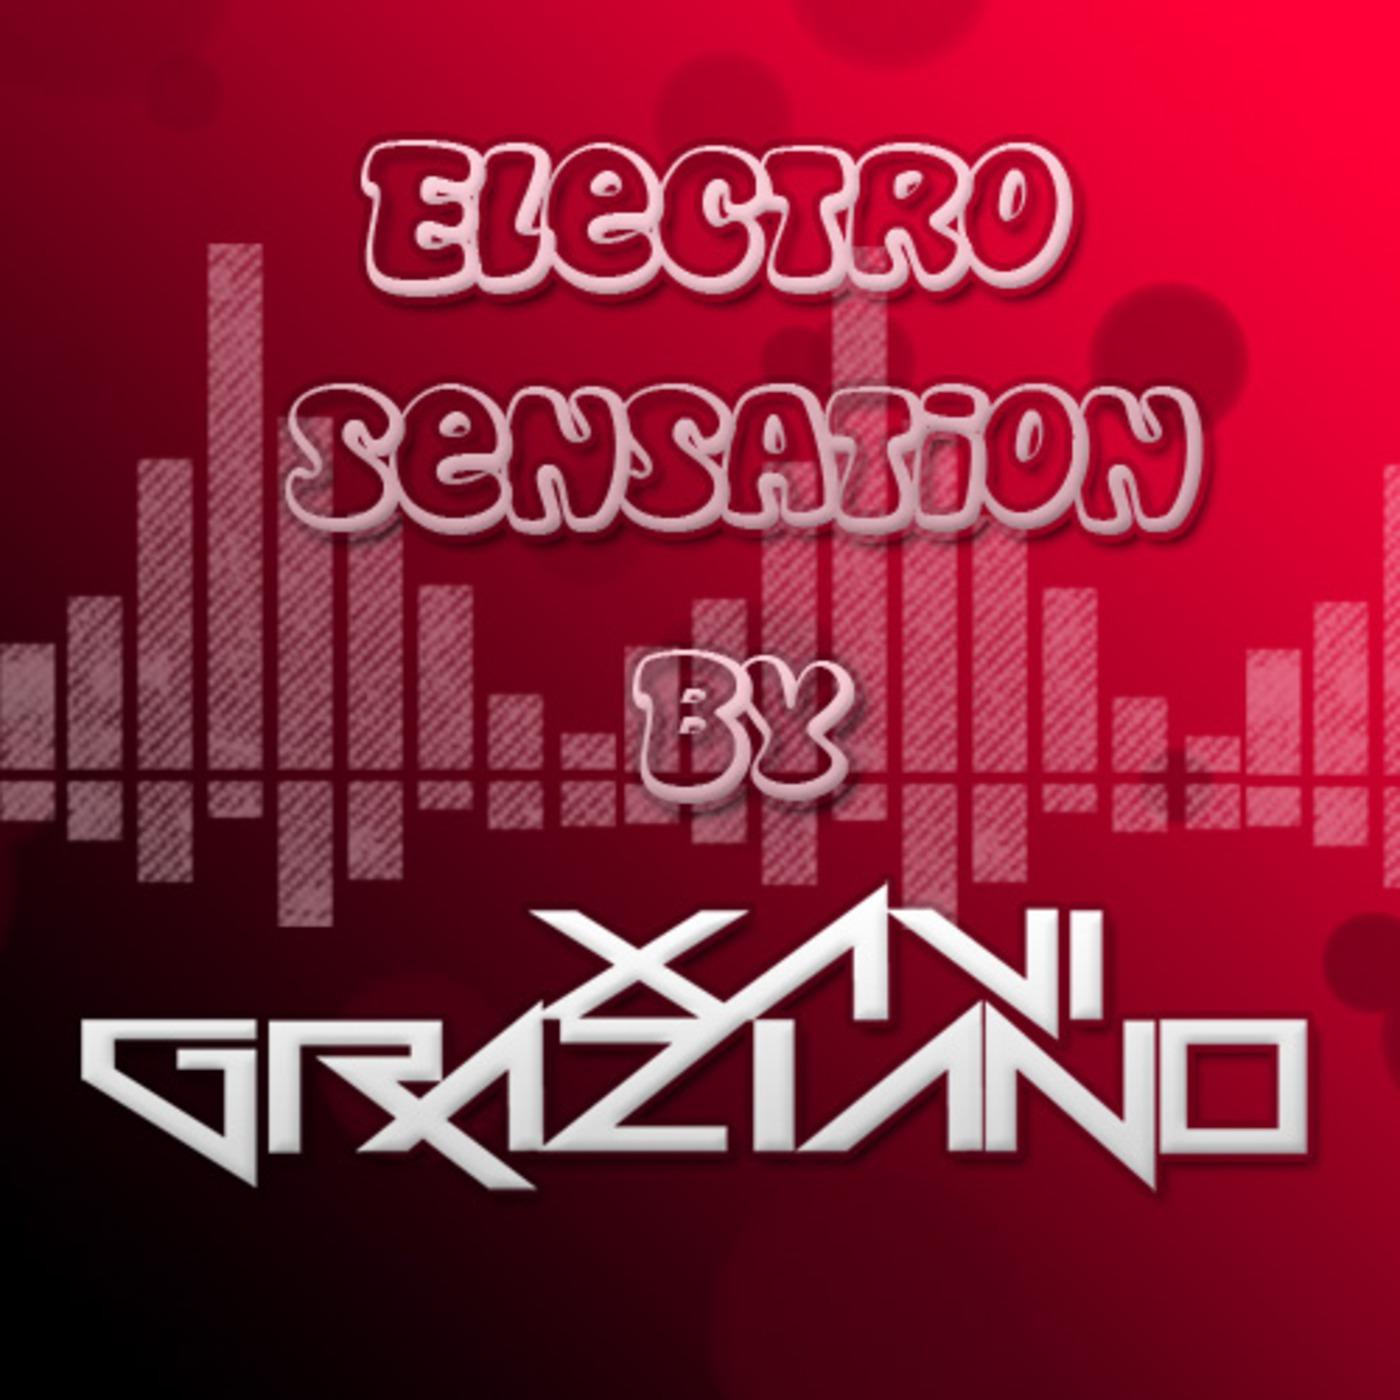 Electro Sensation By Xavi Graziano